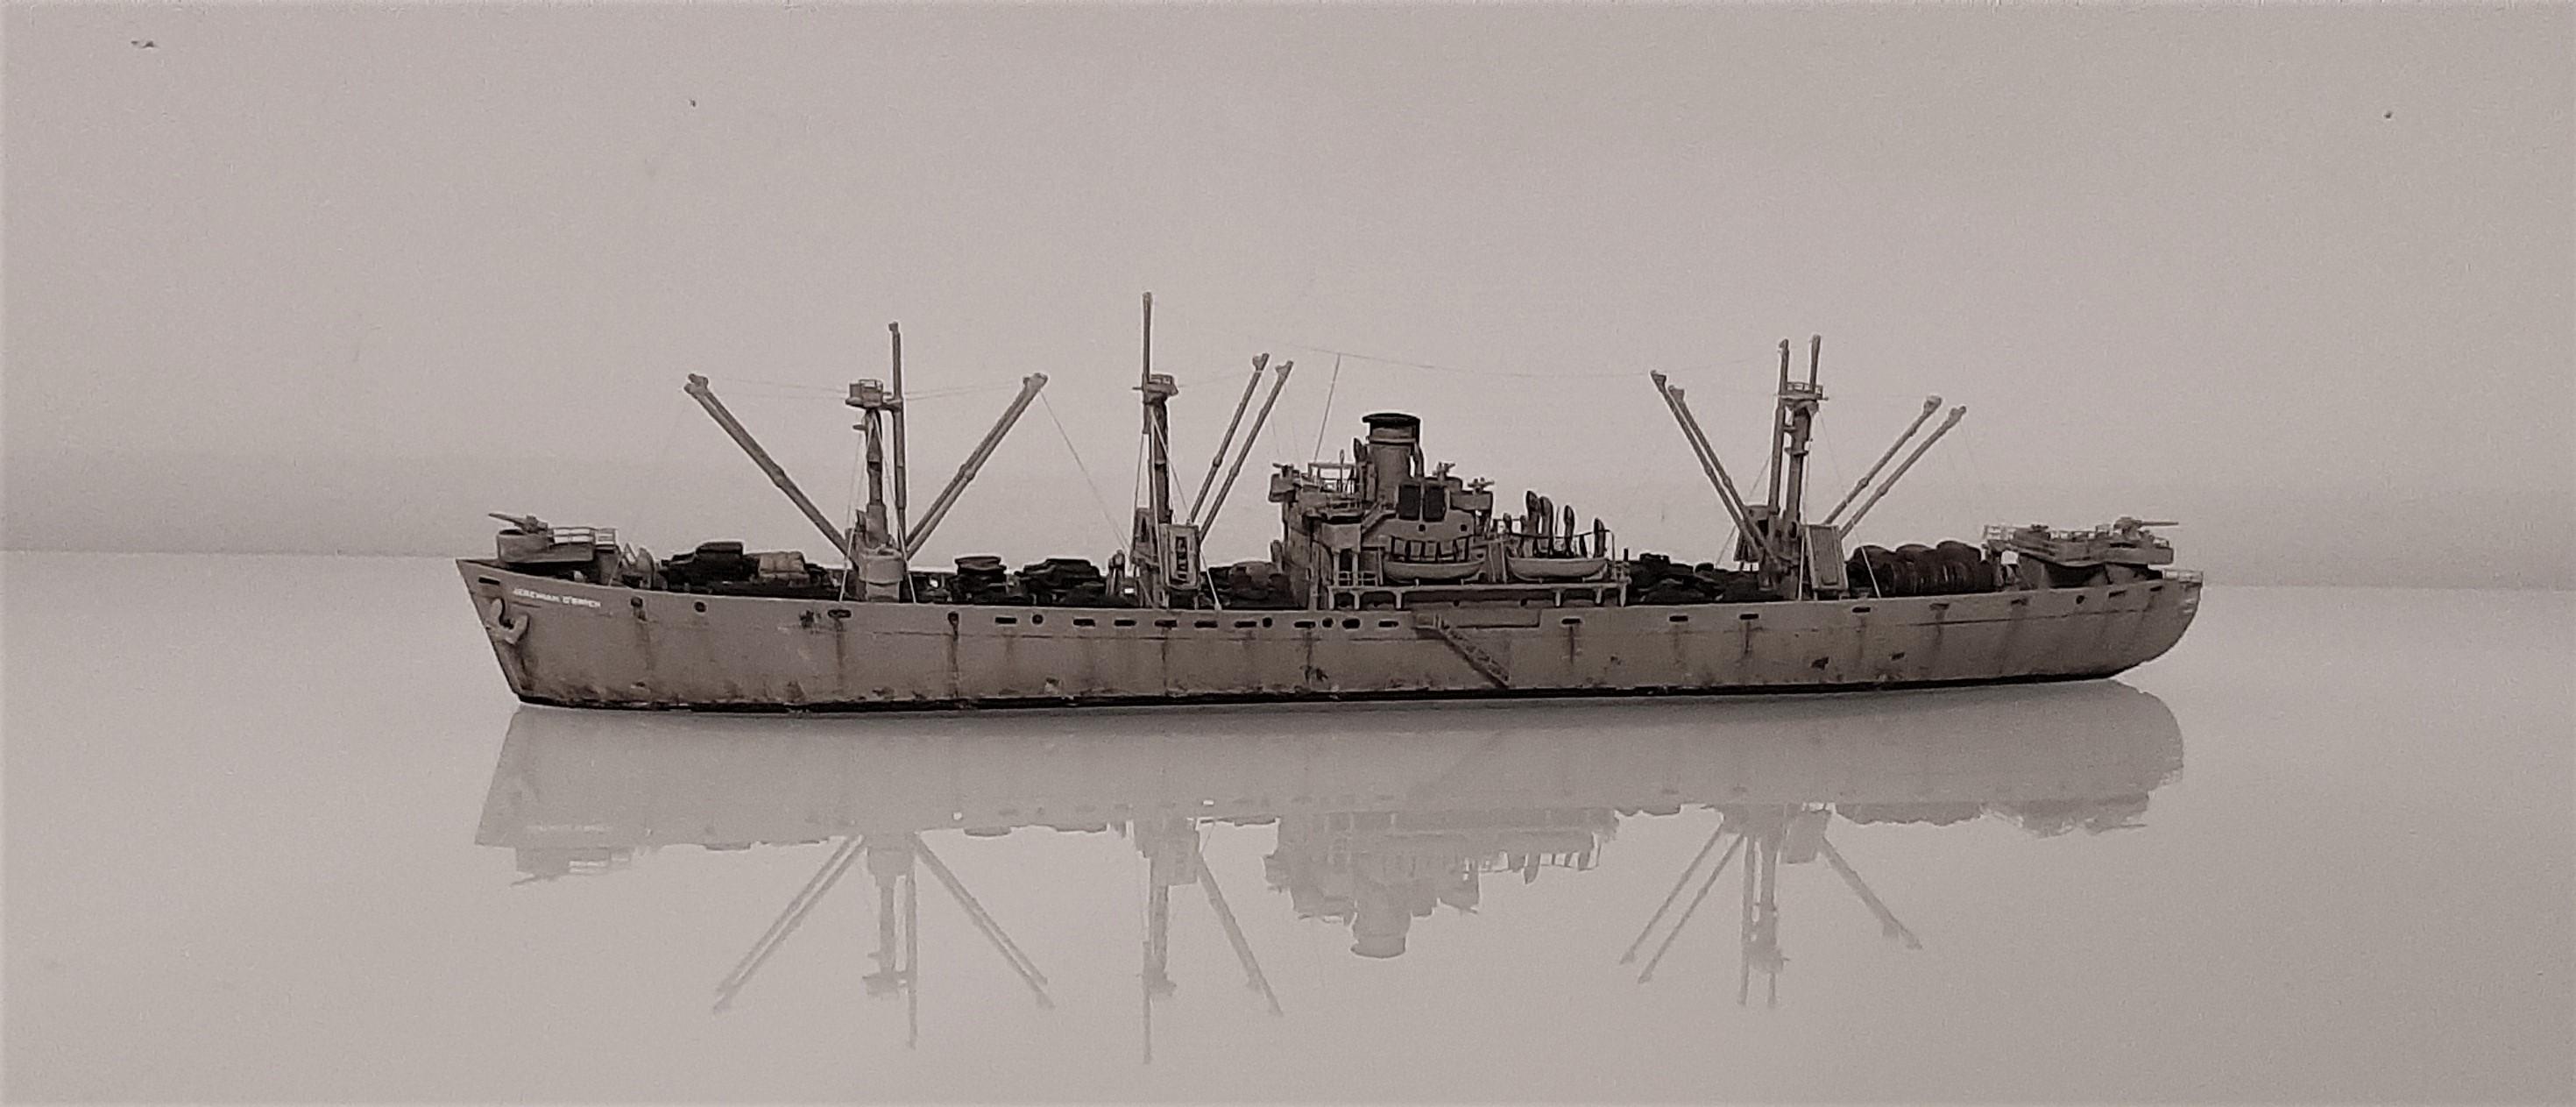 Liberty ship Jeremiah O'Brien 1/700 Trumpeter  2VFnia